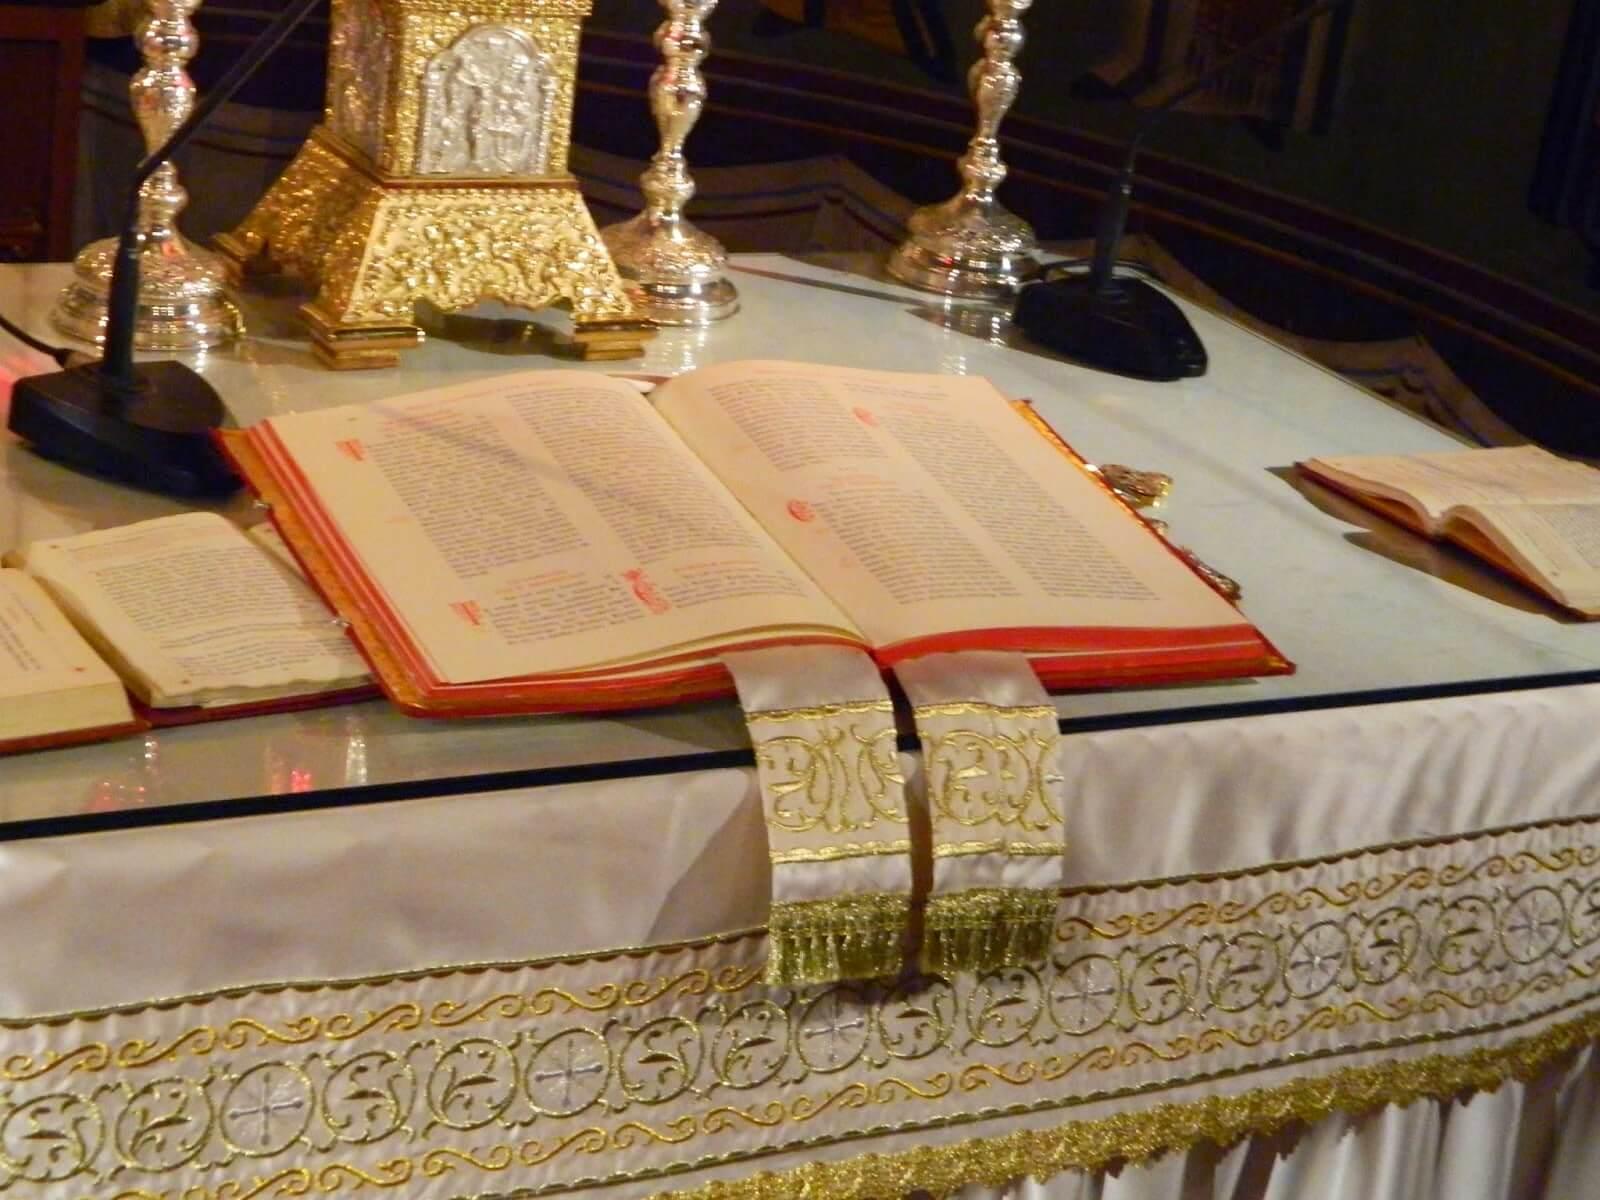 Kυριακή της Πεντηκοστής: Κατά Ιωάννην Ευαγγέλιο (Ζ´ 35-52, Η΄ 12)